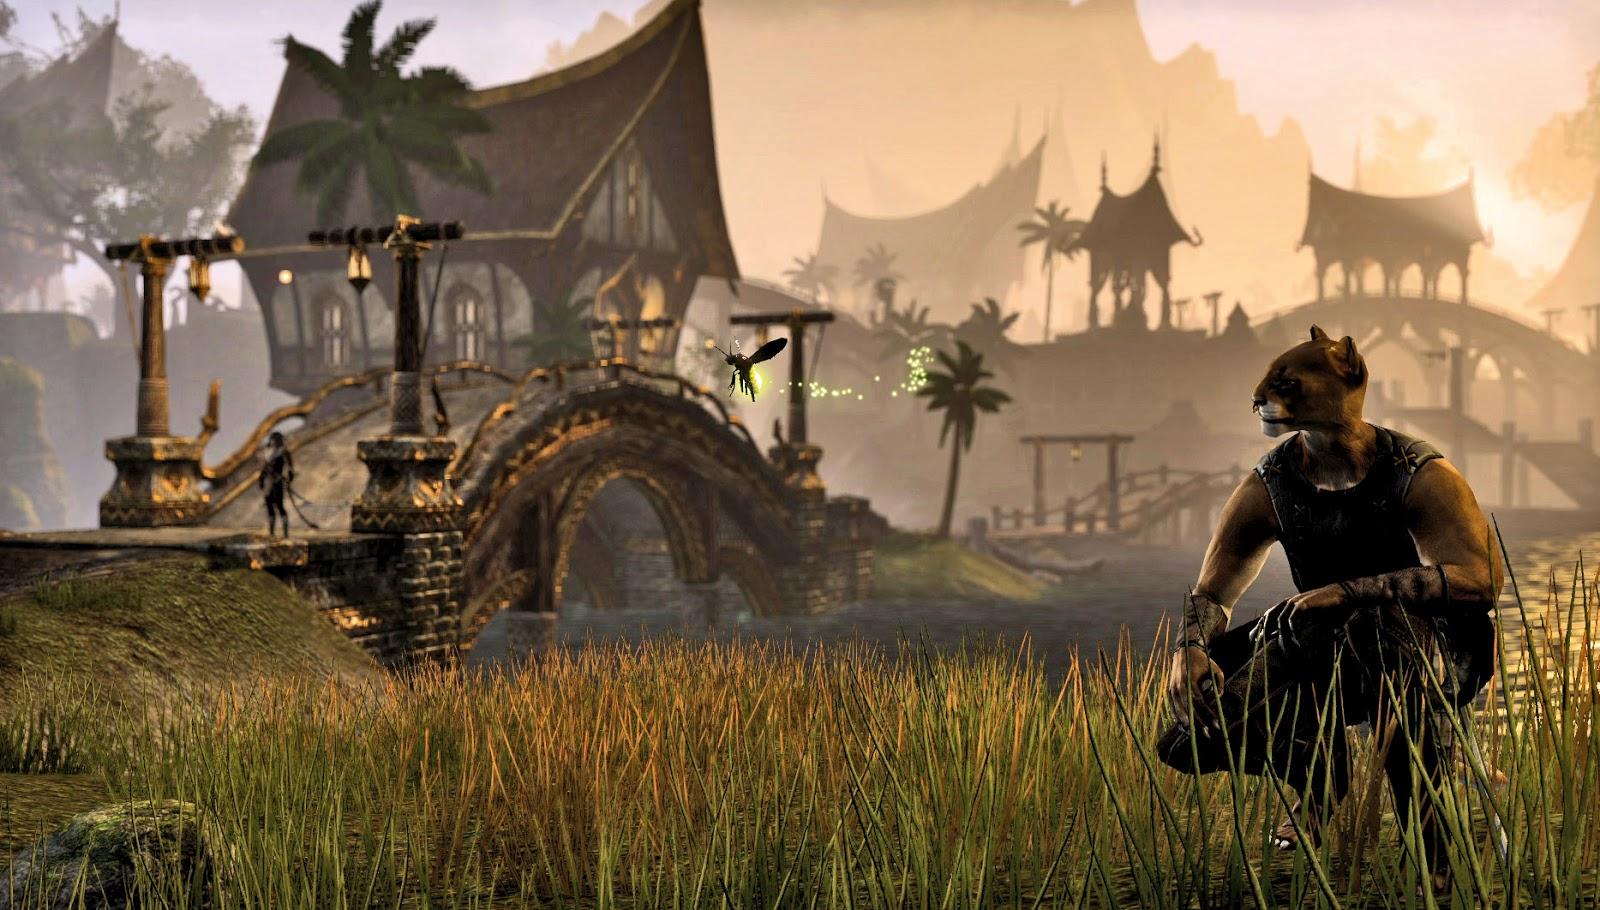 The-Elder-Scrolls-Online-Khajiit-at-sunset